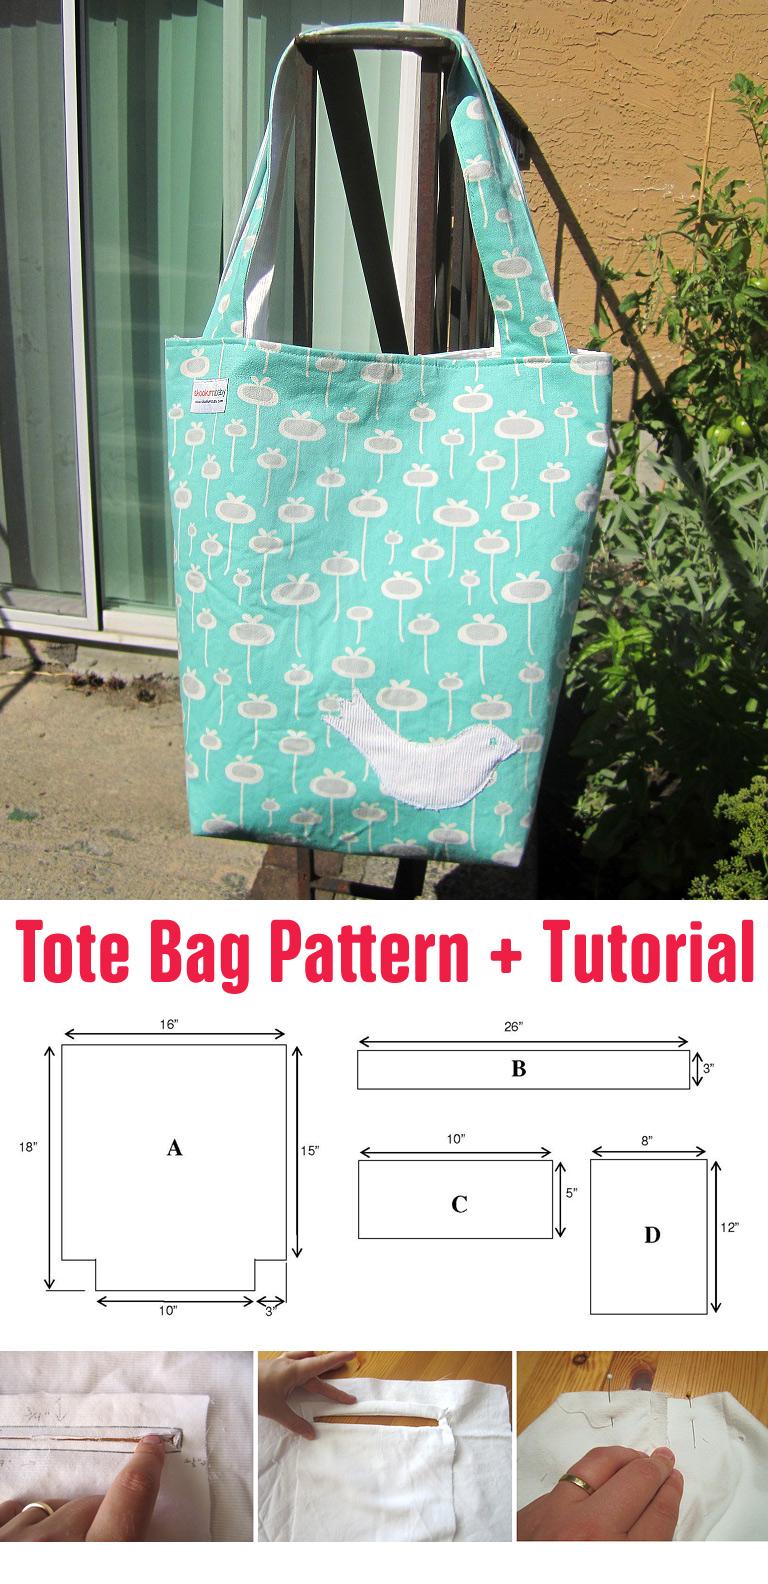 Tote Bag Pattern + Tutorial